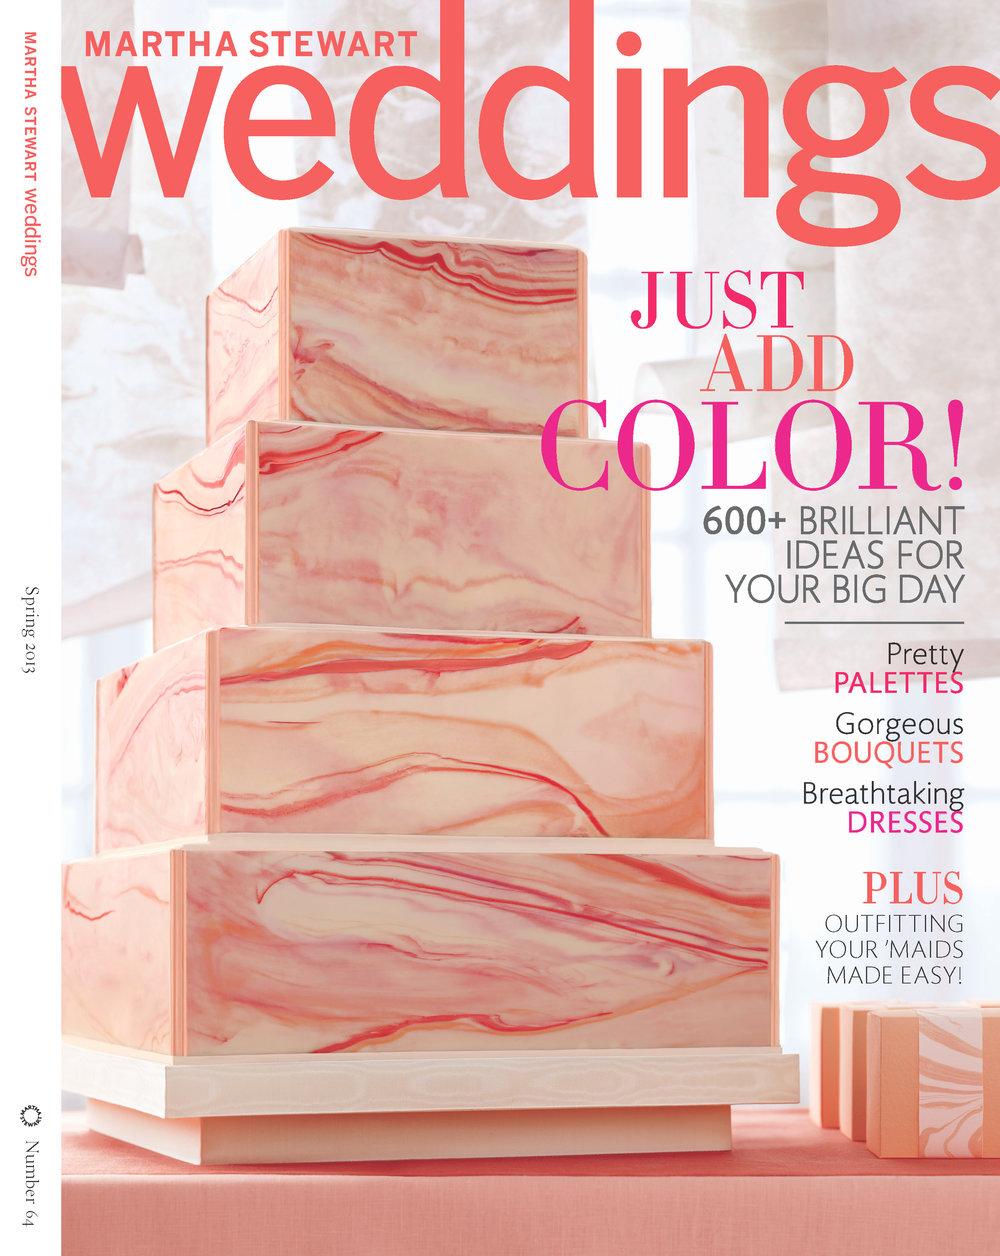 Weddings Spring 13 Cover.jpg